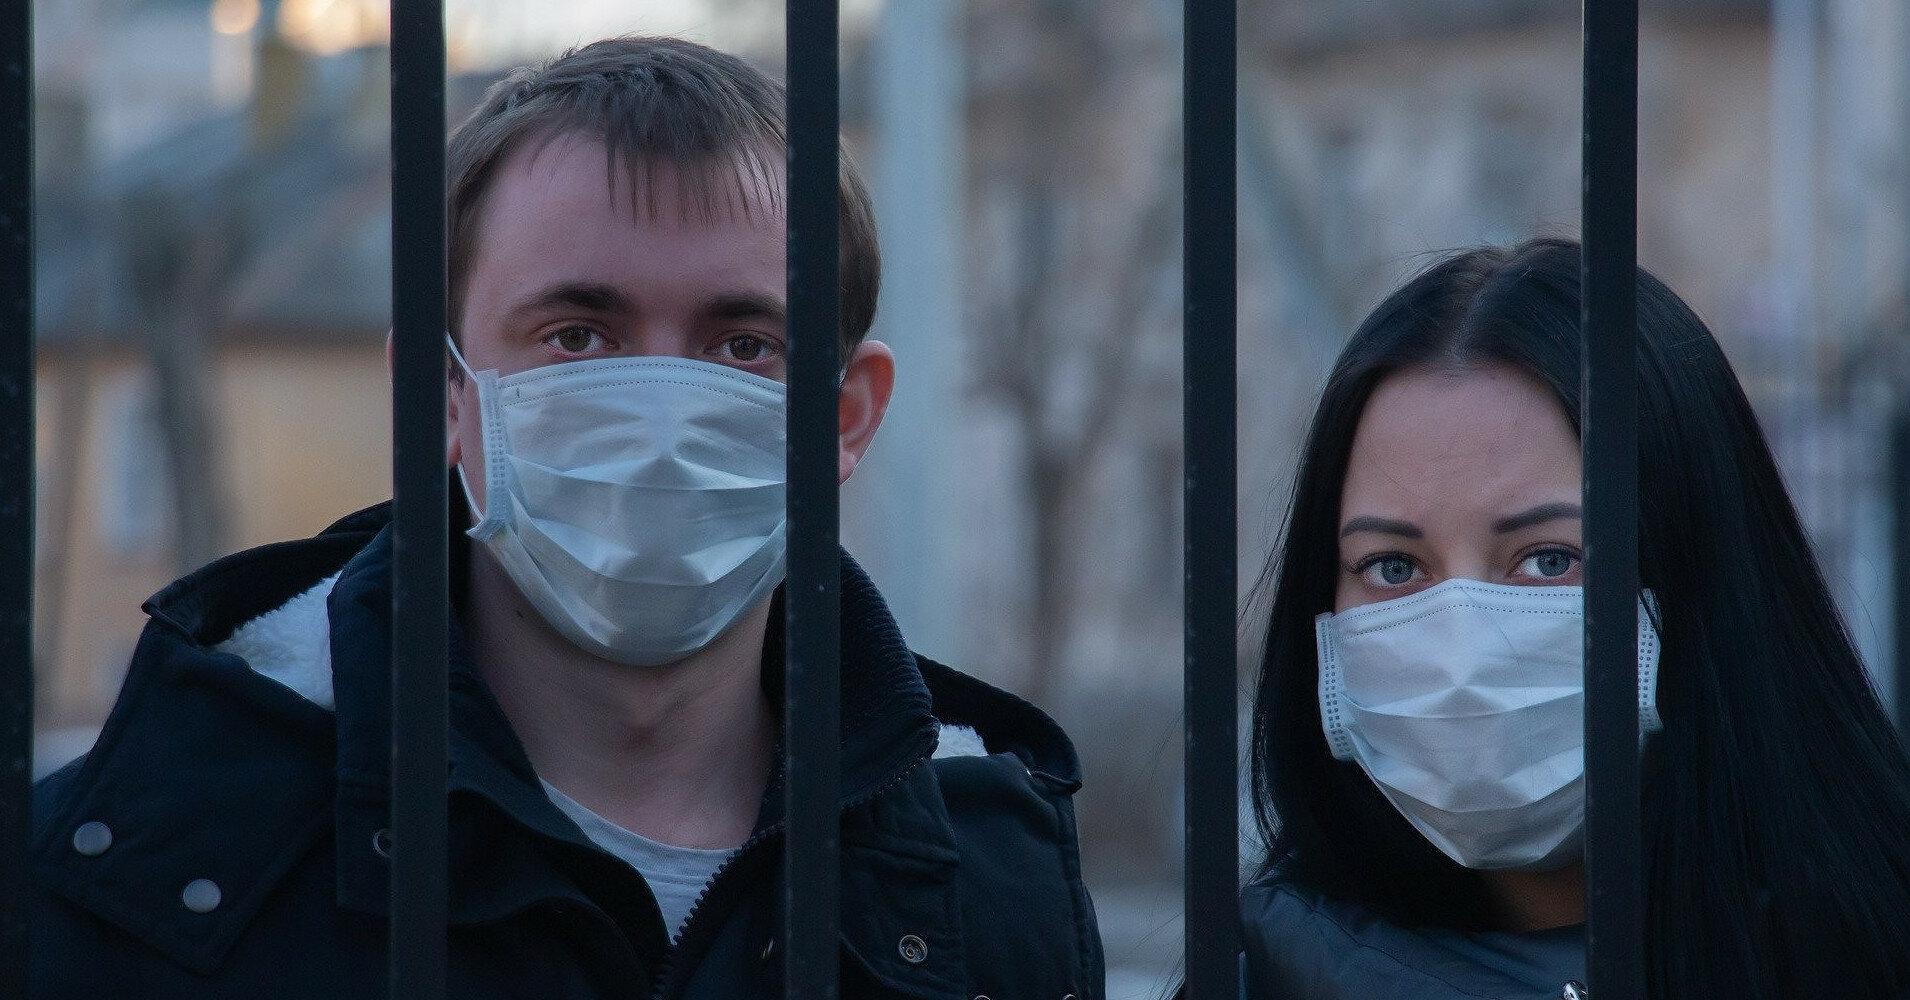 В Москве пресекли митинг противников вакцинации